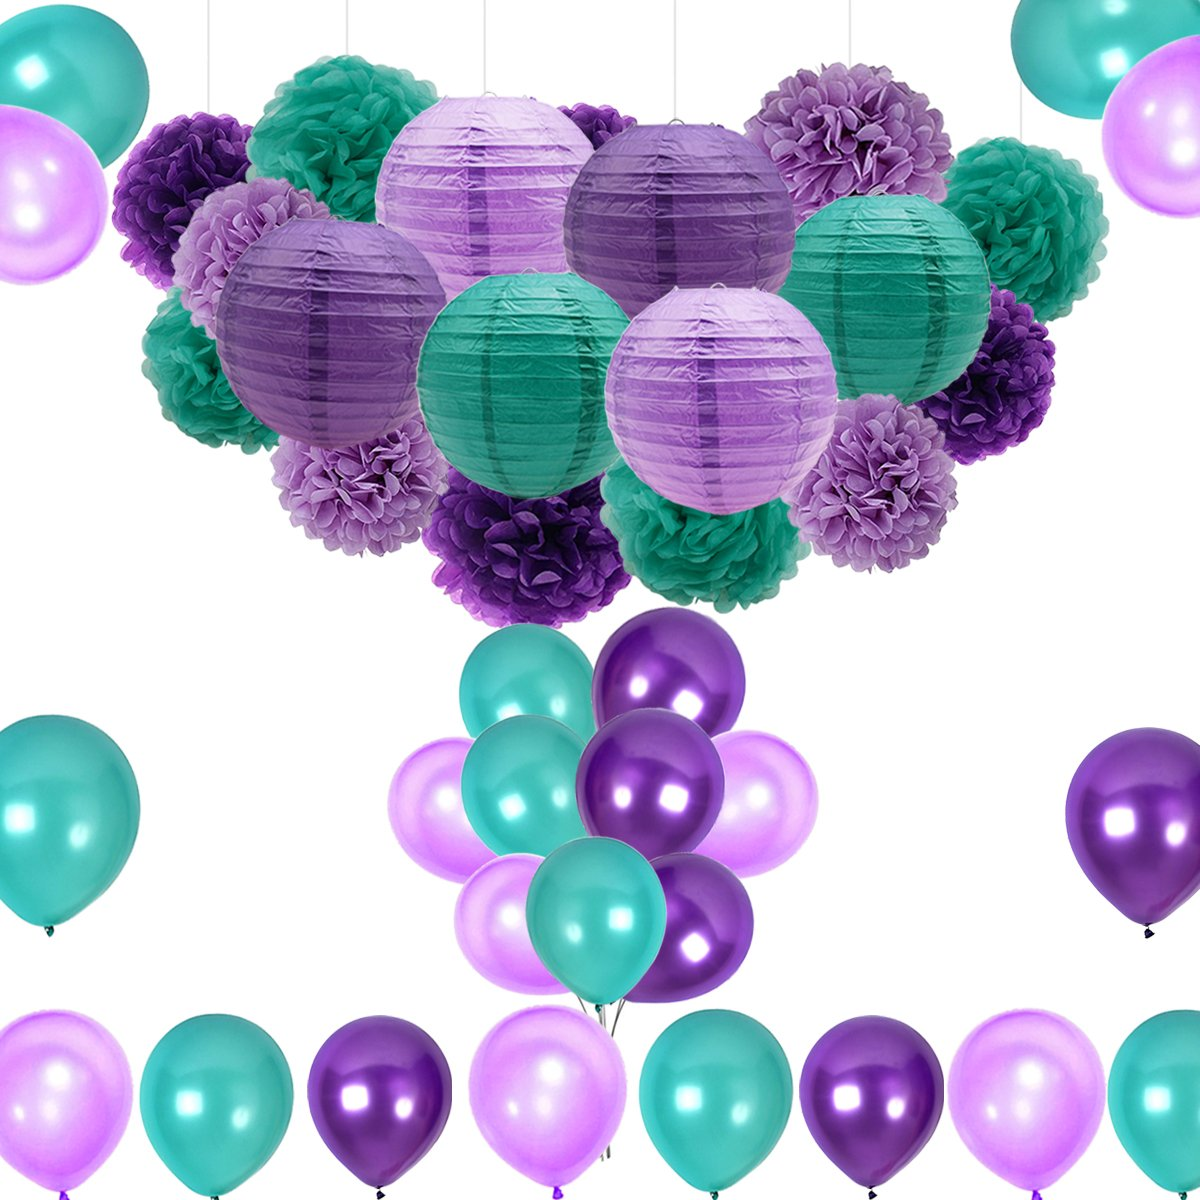 Mermaid Party Decorations/Under the Sea Party Supplies 36pcs Teal Lavender Purple Pom Poms Lanterns Balloons for Mermaid Birthday Party Supplies Baby Shower Decorations Frozen Party Supplies